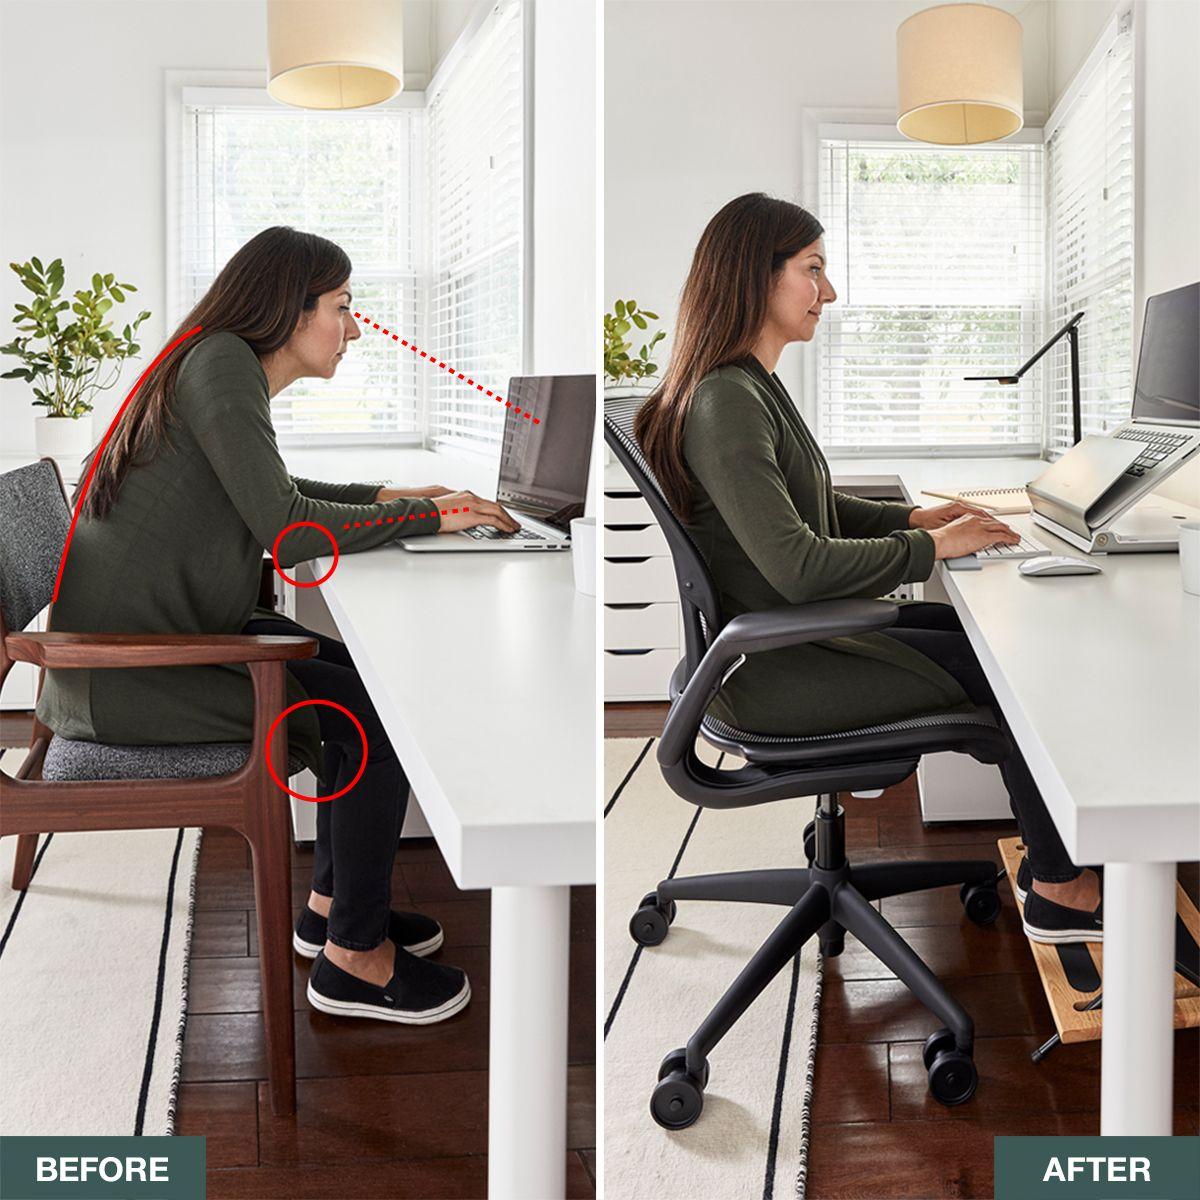 Humanscale ergoIQ HOME ergonomics assessment platform